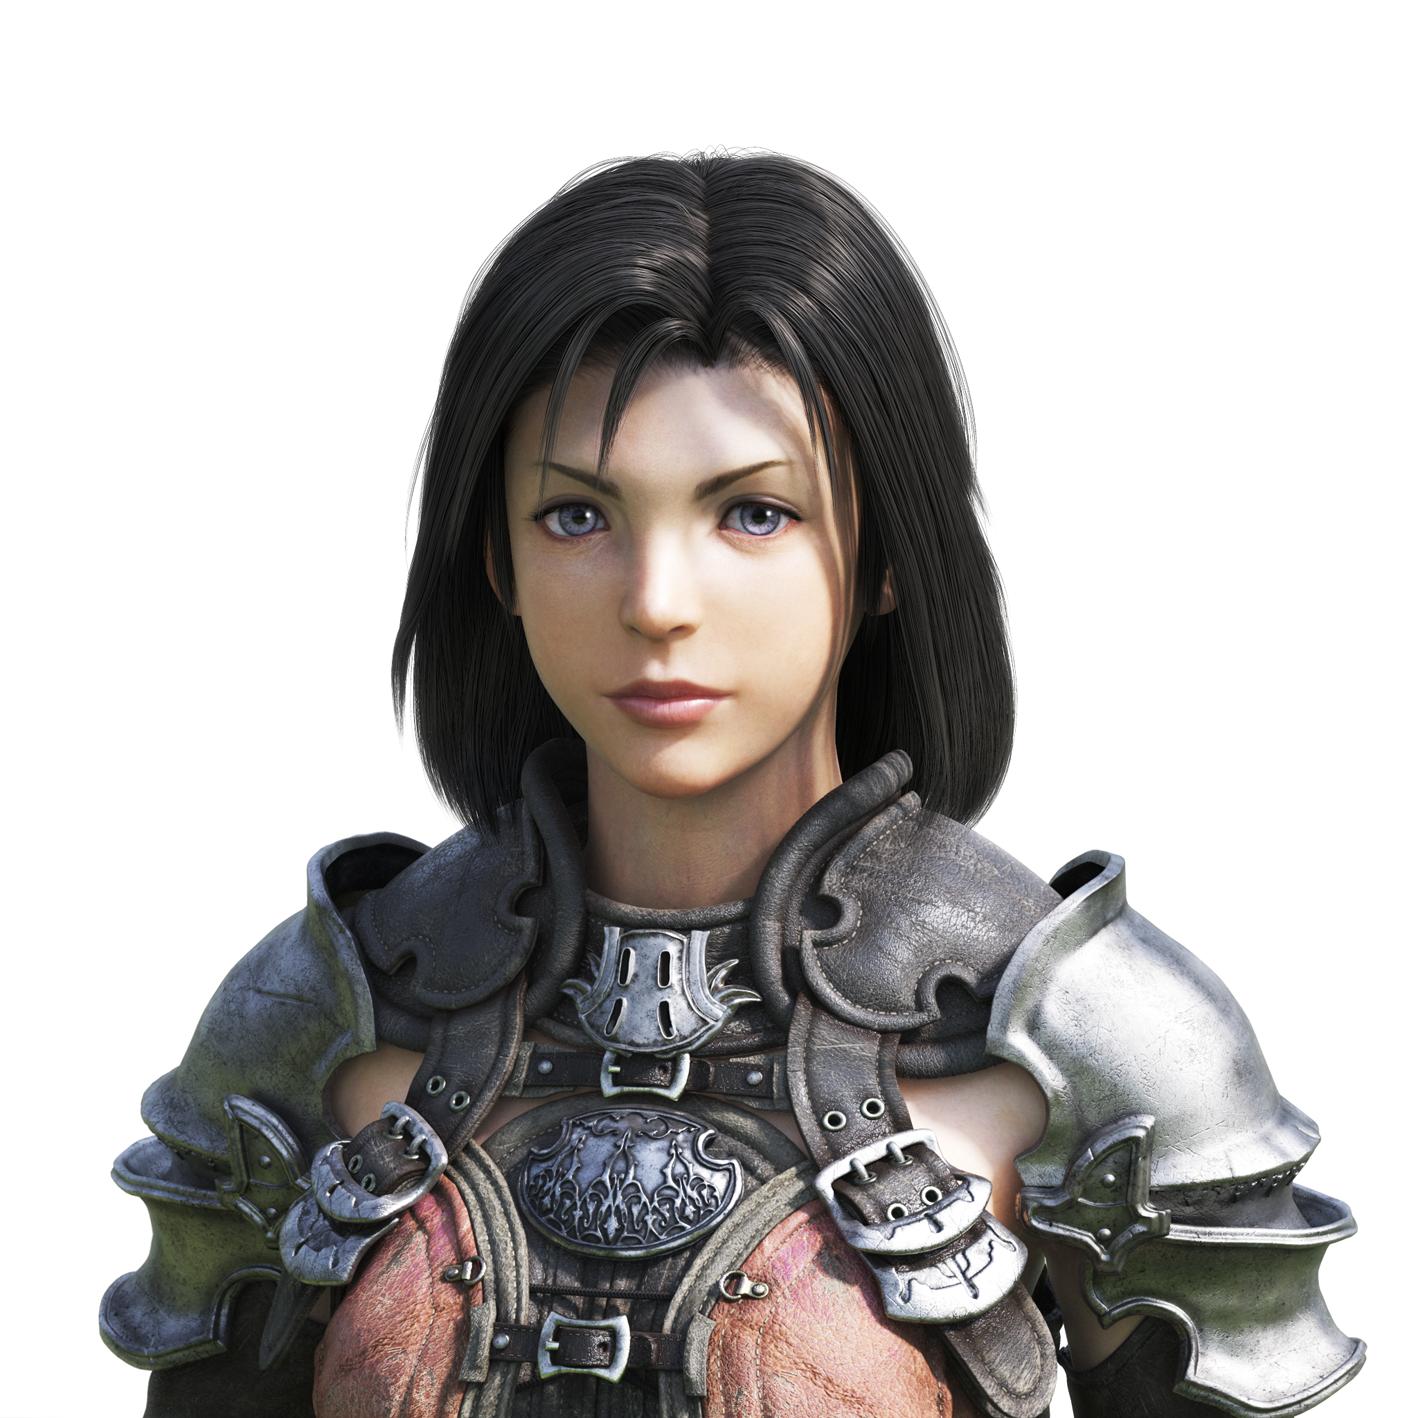 Final fantasy xiv hyur female - photo#2